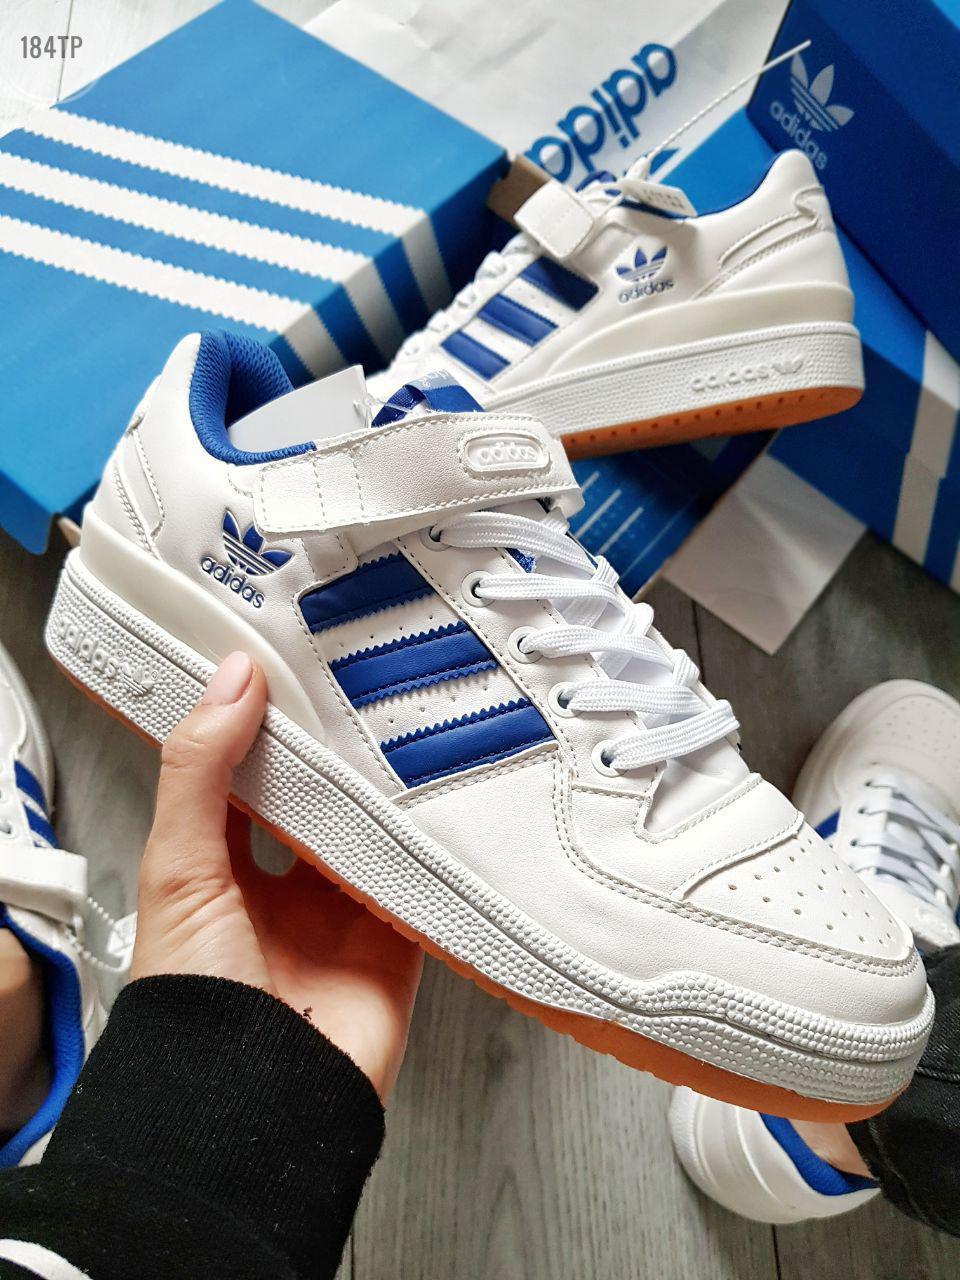 Мужские кроссовки Adidas forum mіd White Blue (р. 41 42 43 44) Белые